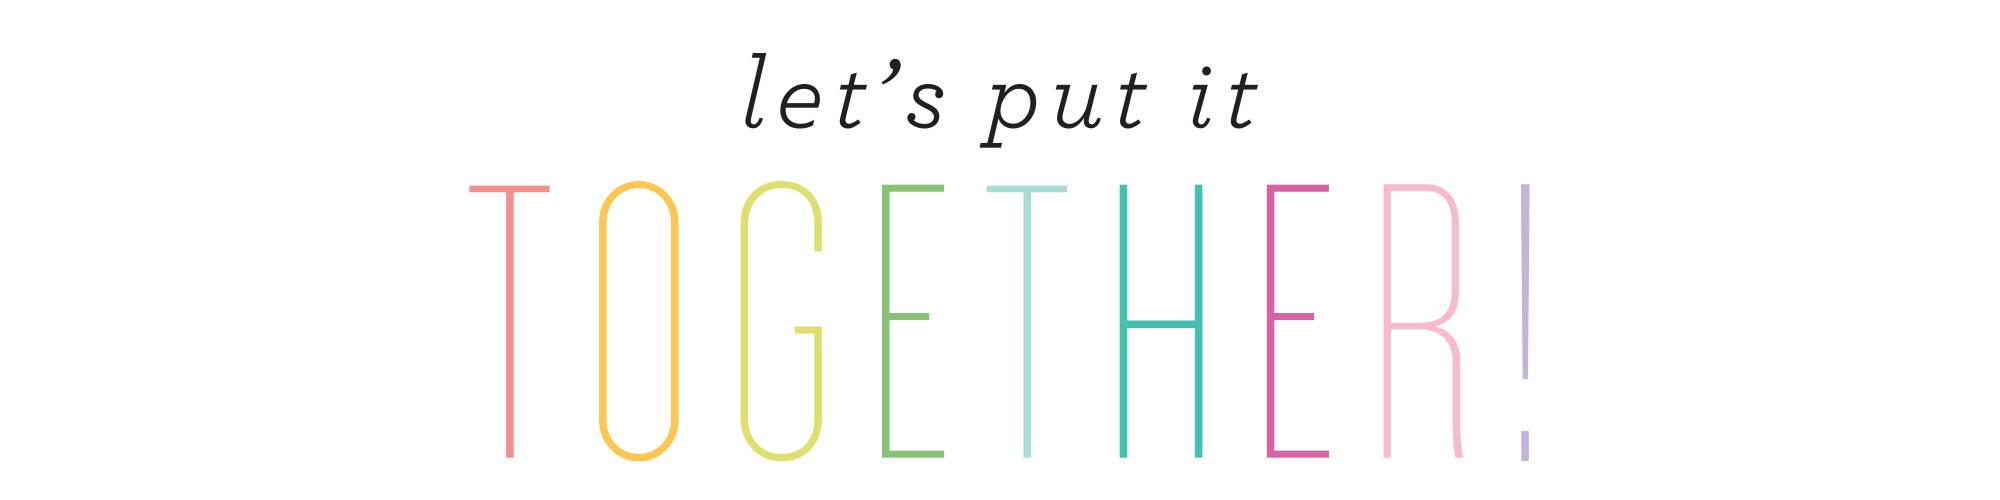 Let's Put it Together!